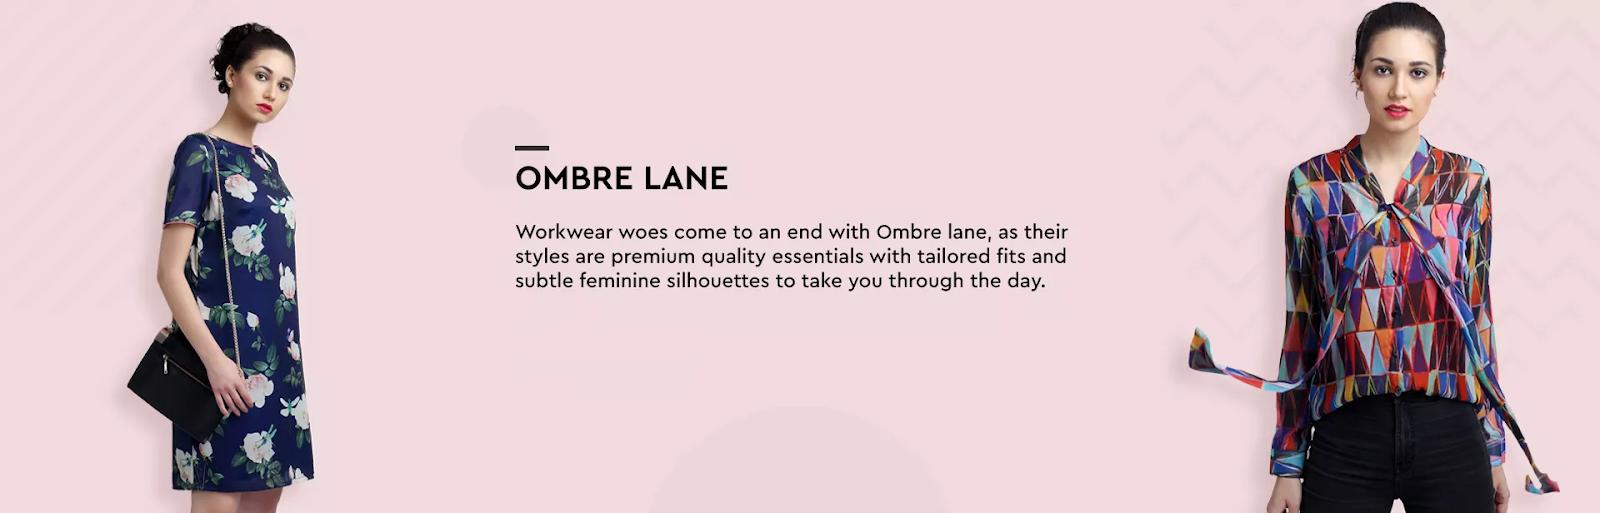 Ombre lane